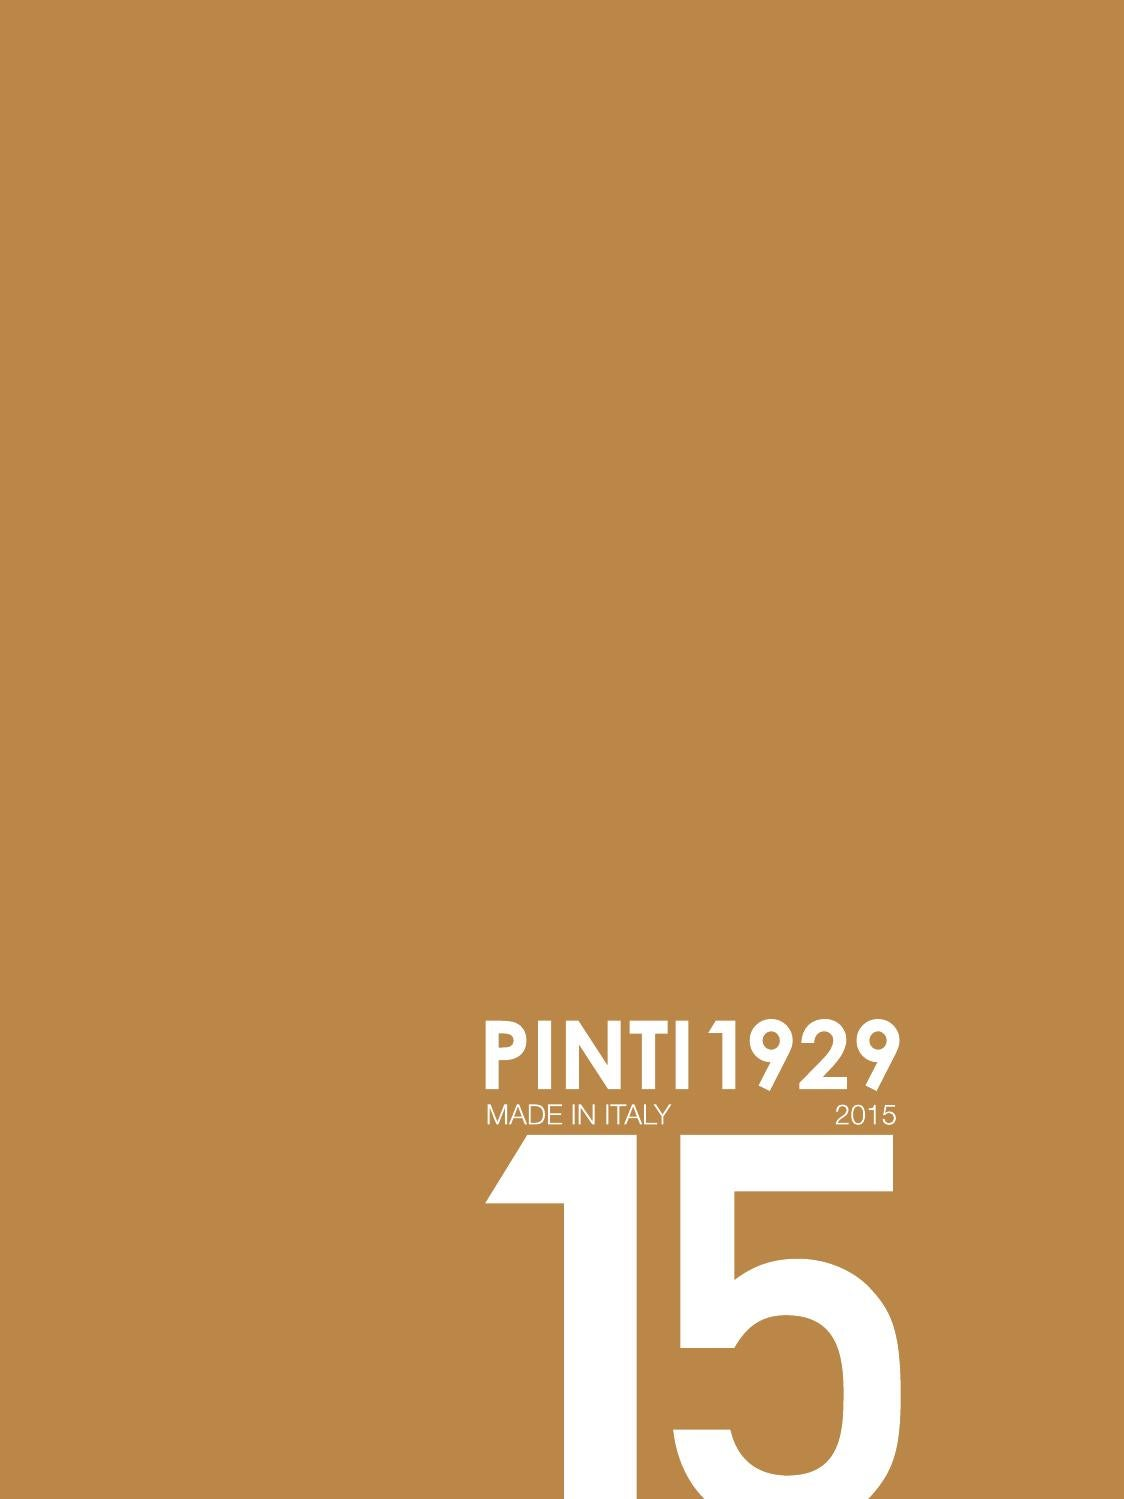 "Acier Inoxydable Design-couverts /""treccia/"" du tradition entreprise pinti 1929"